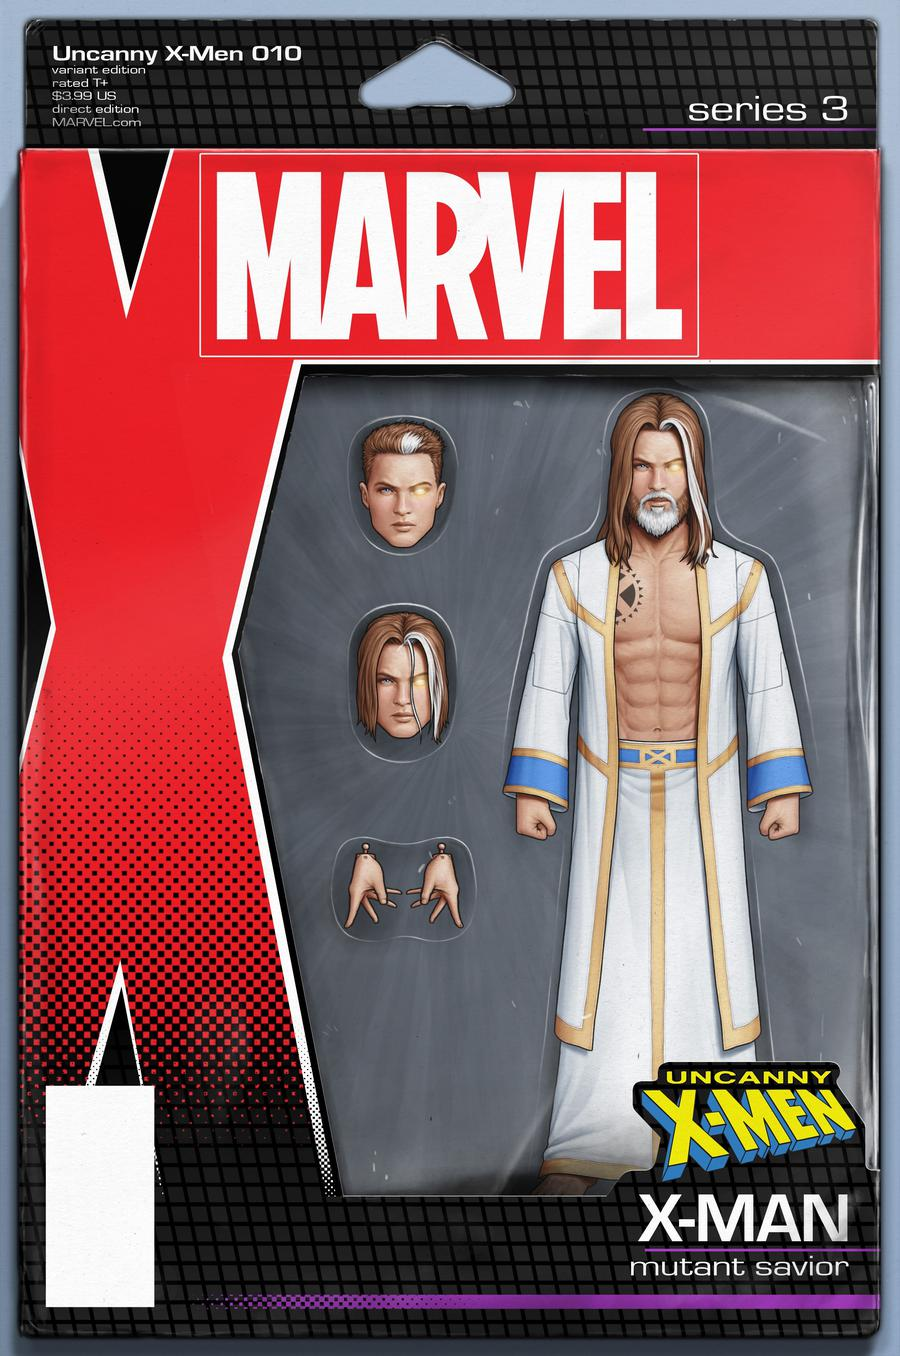 Uncanny X-Men Vol 5 #10 Cover B Variant John Tyler Christopher Action Figure Cover